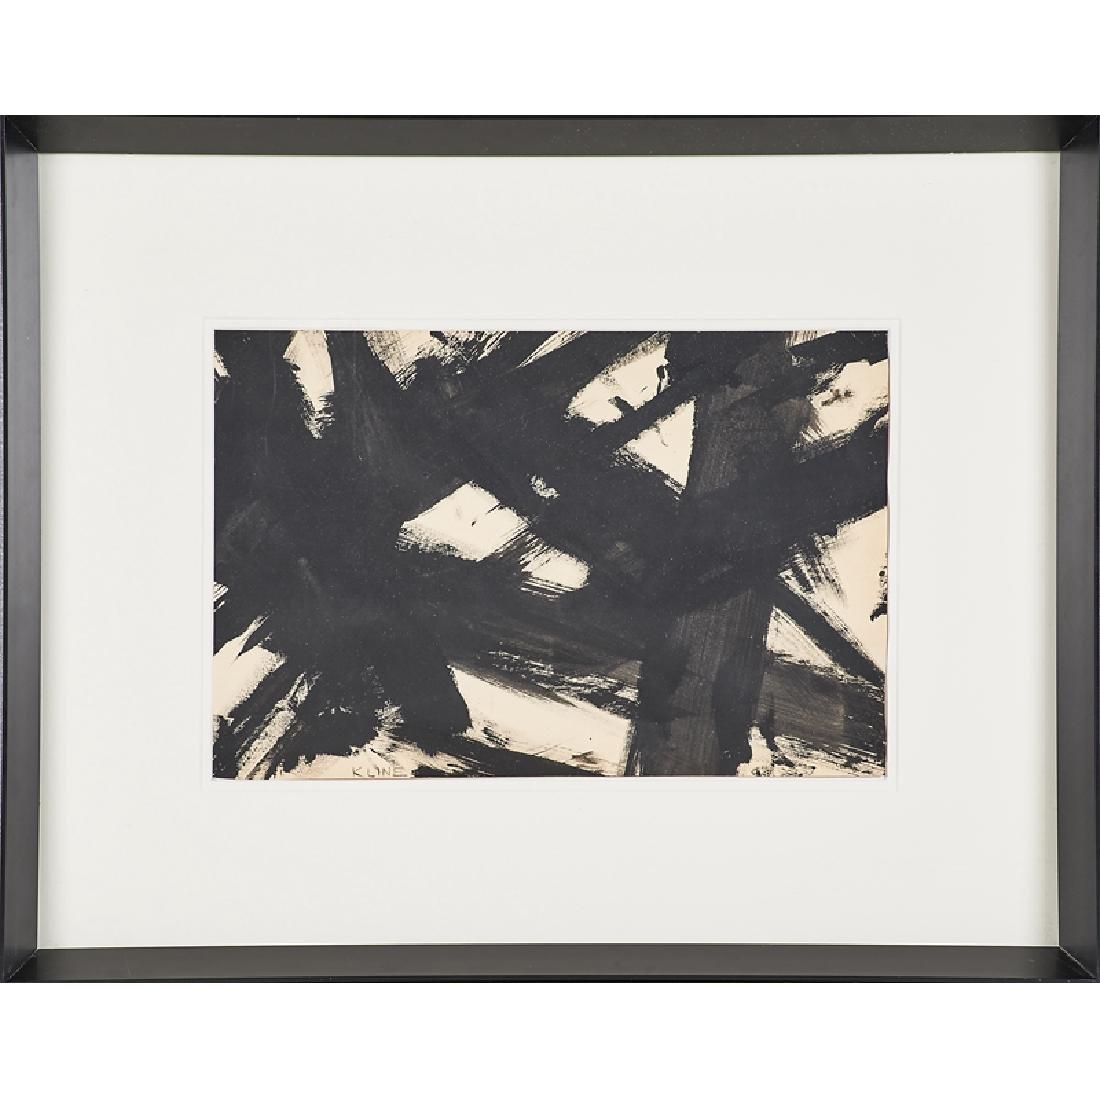 STYLE OF FRANZ KLINE (American, 1910-1962)